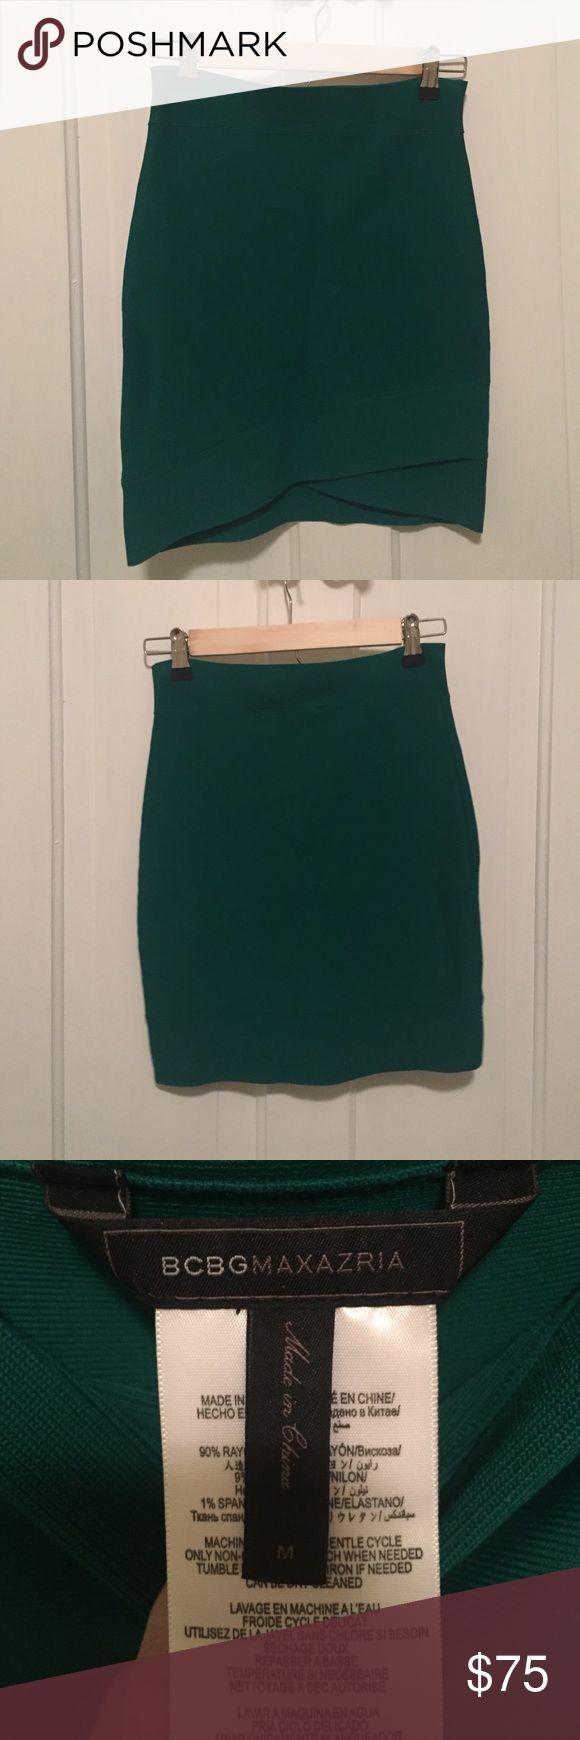 BCBG Maxazria green bondage mini skirt. Size M BCBG Maxazria emerald green bondage mini skirt. Size medium. Perfect for going out! Excellent condition! BCBGMaxAzria Skirts Mini